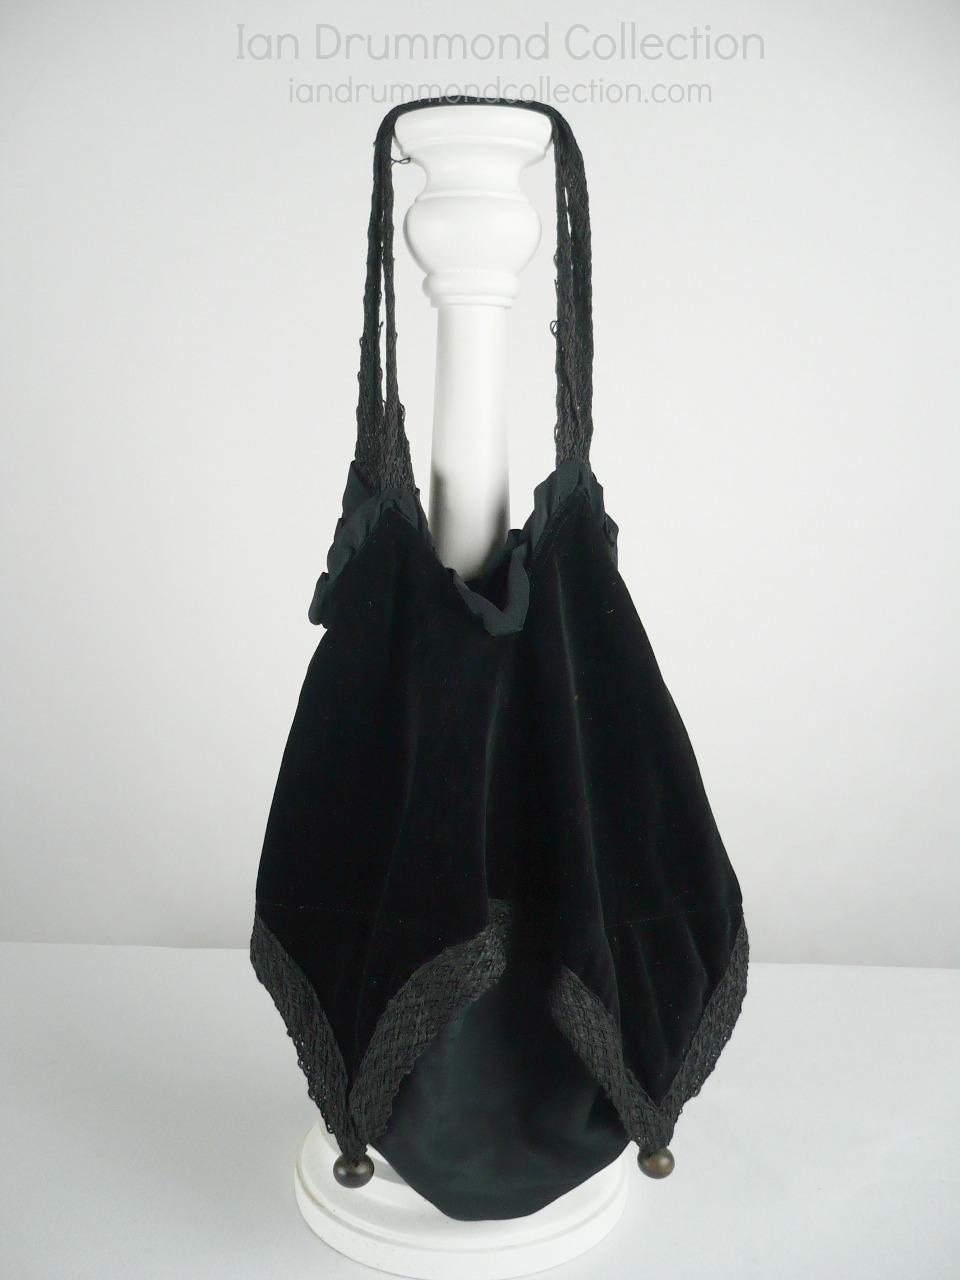 Ian Drummond Collection TV Movie Vintage Clothing Wardrobe Rental Toronto 1920s purse 18 (1)